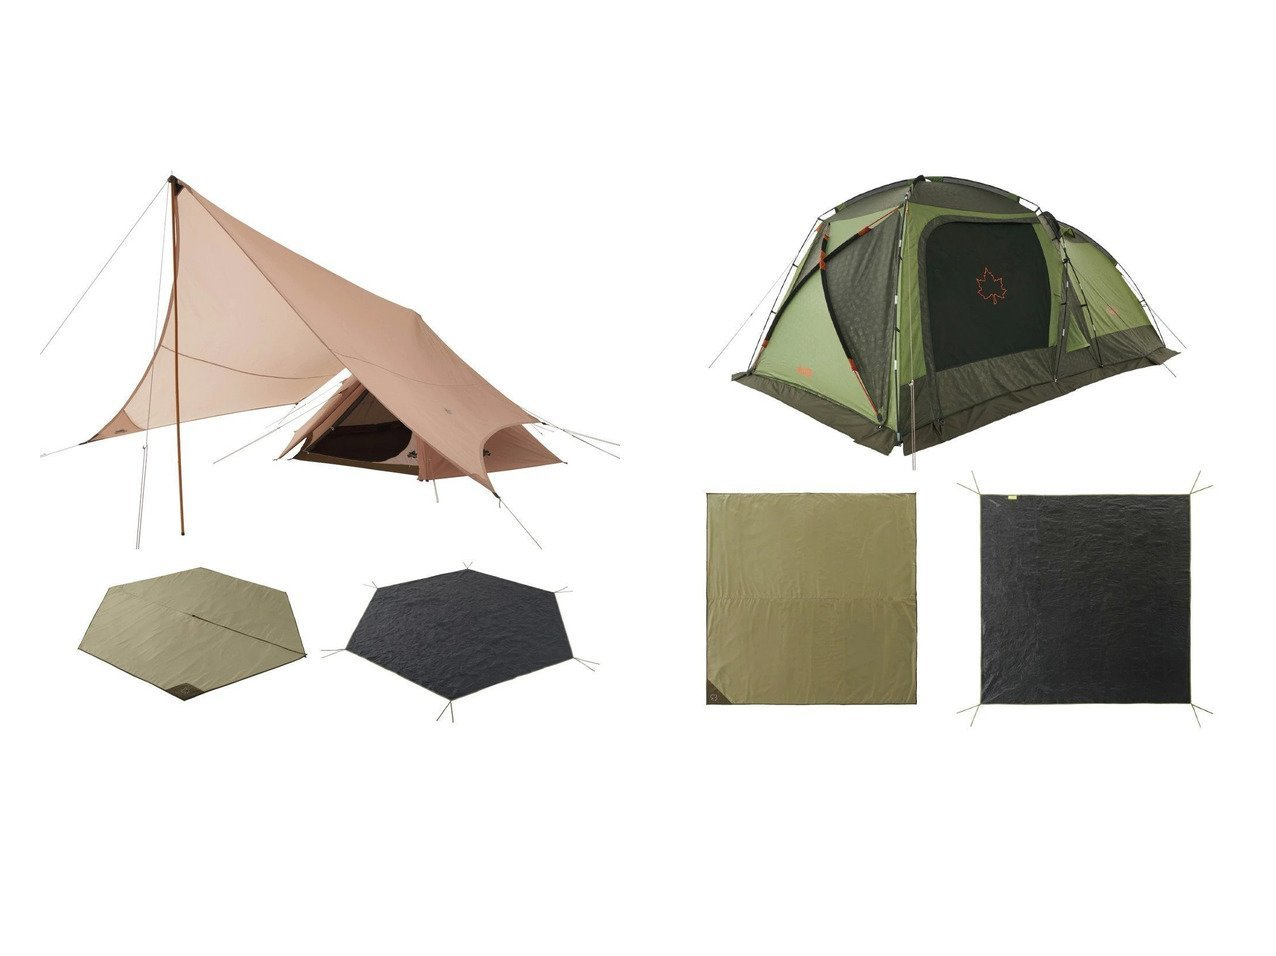 【LOGOS/ロゴス】のファミリーテント テント テントチャレンジセットTrad ティピータープ350-BJ 71809562&テントチャレンジセットneos PANELスクリーンドゥーブル XL-BJ 71809560 おすすめ!人気キャンプ・アウトドア用品の通販 おすすめで人気の流行・トレンド、ファッションの通販商品 メンズファッション・キッズファッション・インテリア・家具・レディースファッション・服の通販 founy(ファニー) https://founy.com/ インナー タフタ 春 Spring セットアップ S/S・春夏 SS・Spring/Summer ホーム・キャンプ・アウトドア Home,Garden,Outdoor,Camping Gear キャンプ用品・アウトドア  Camping Gear & Outdoor Supplies テント タープ Tents, Tarp |ID:crp329100000034774